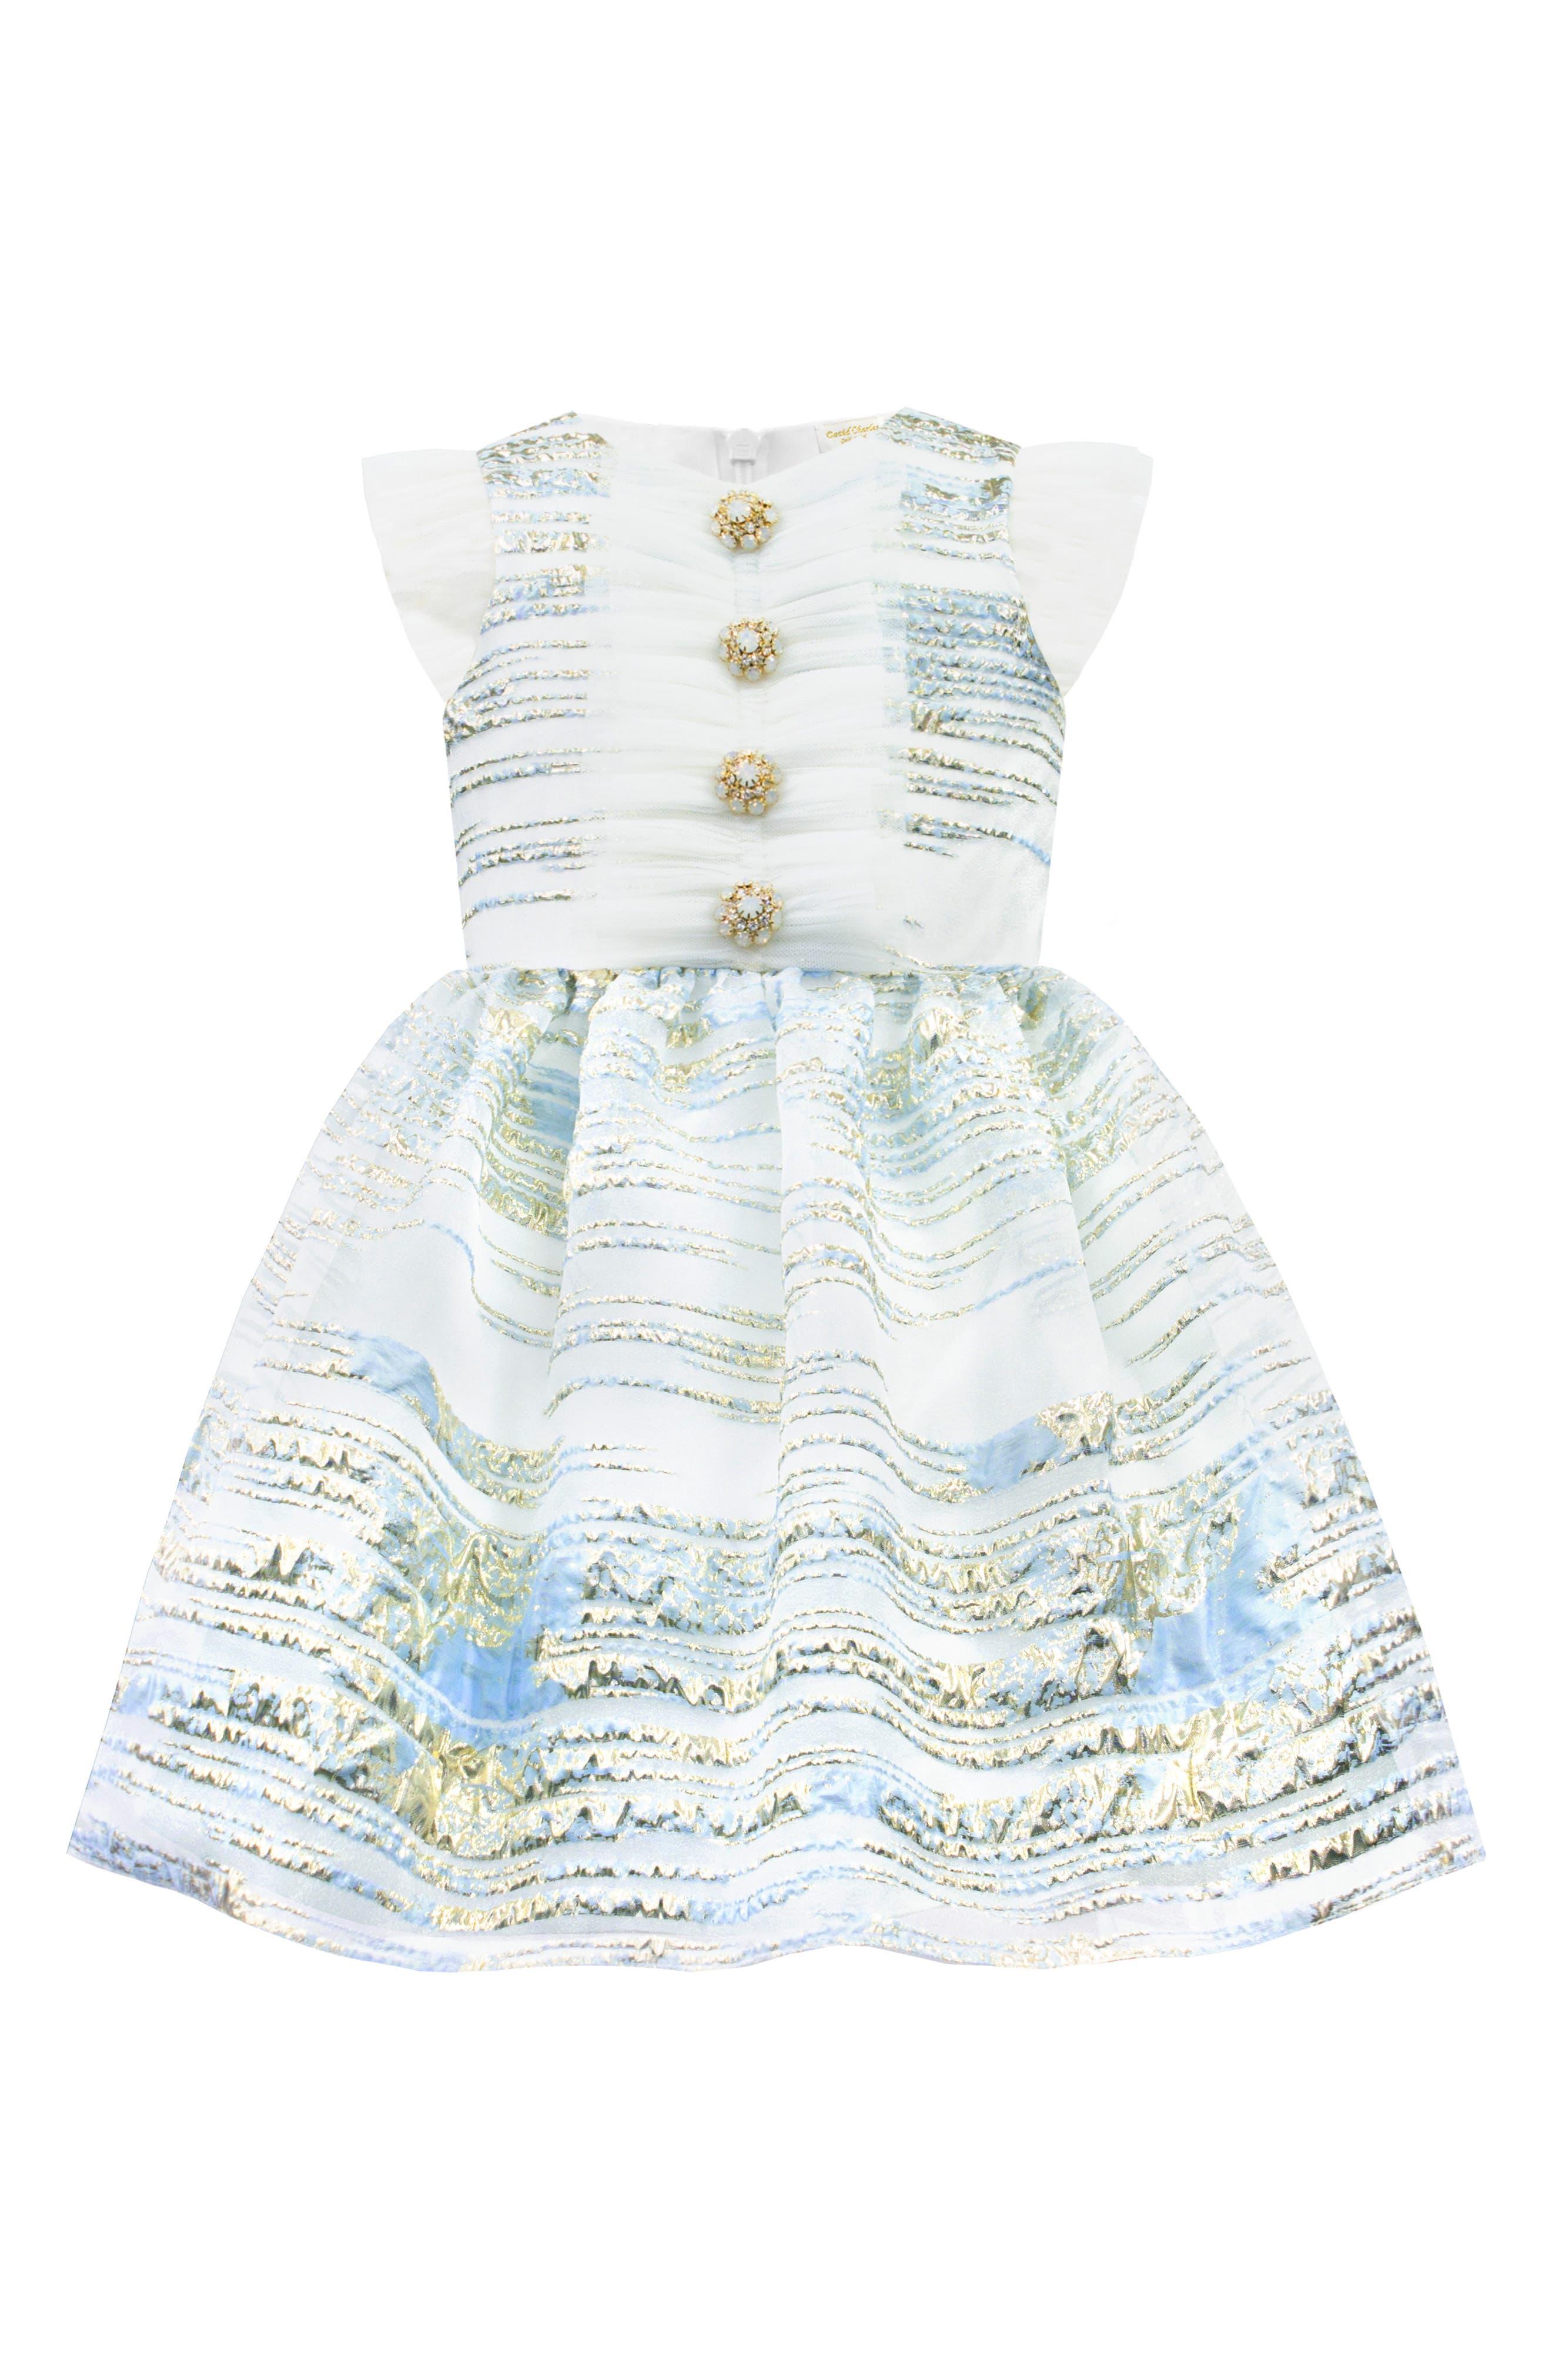 DAVID CHARLES Metallic Stripe Organza Party Dress, Main, color, BLUE